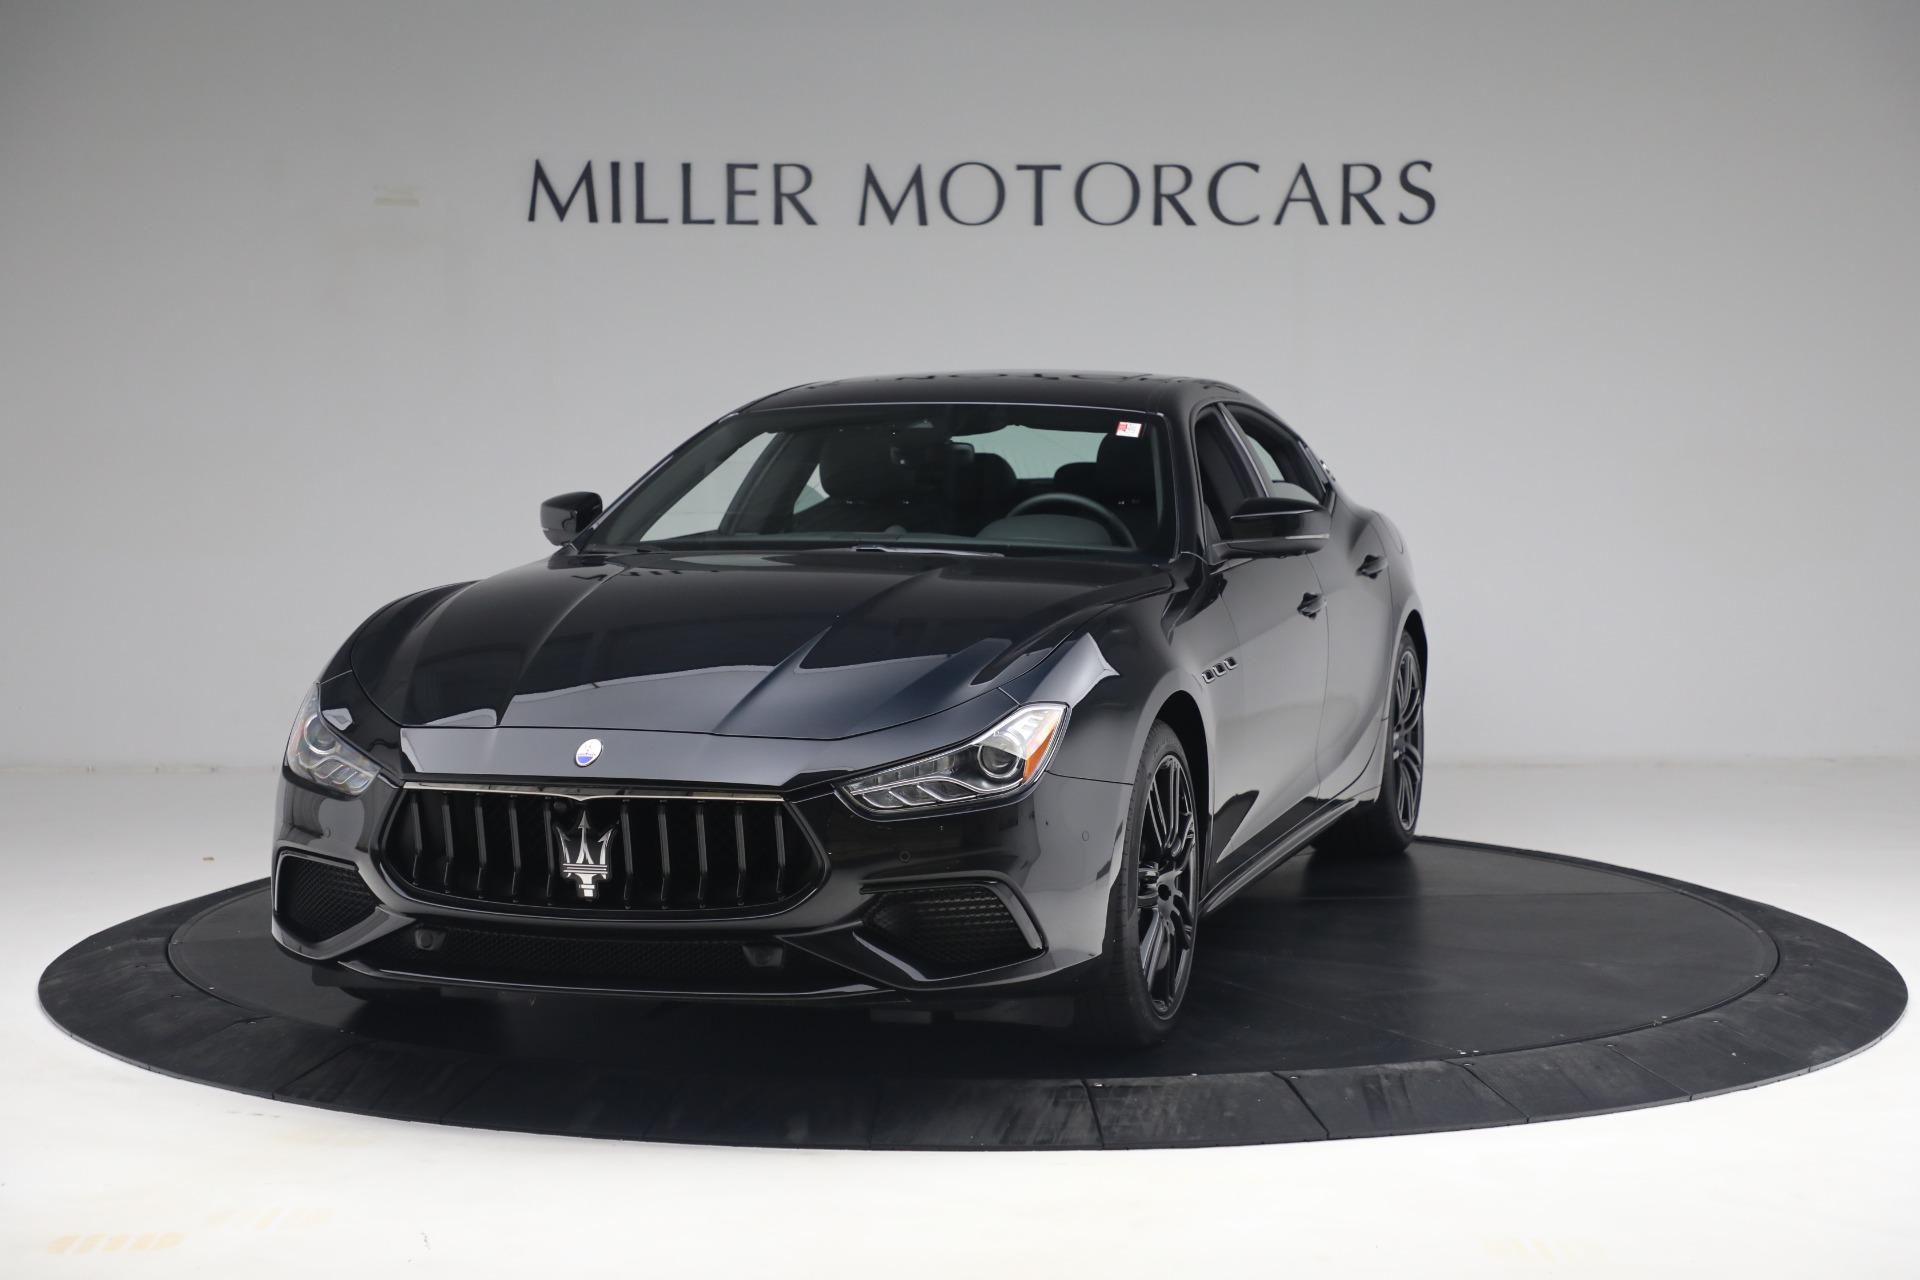 New 2021 Maserati Ghibli SQ4 for sale $92,894 at Alfa Romeo of Greenwich in Greenwich CT 06830 1